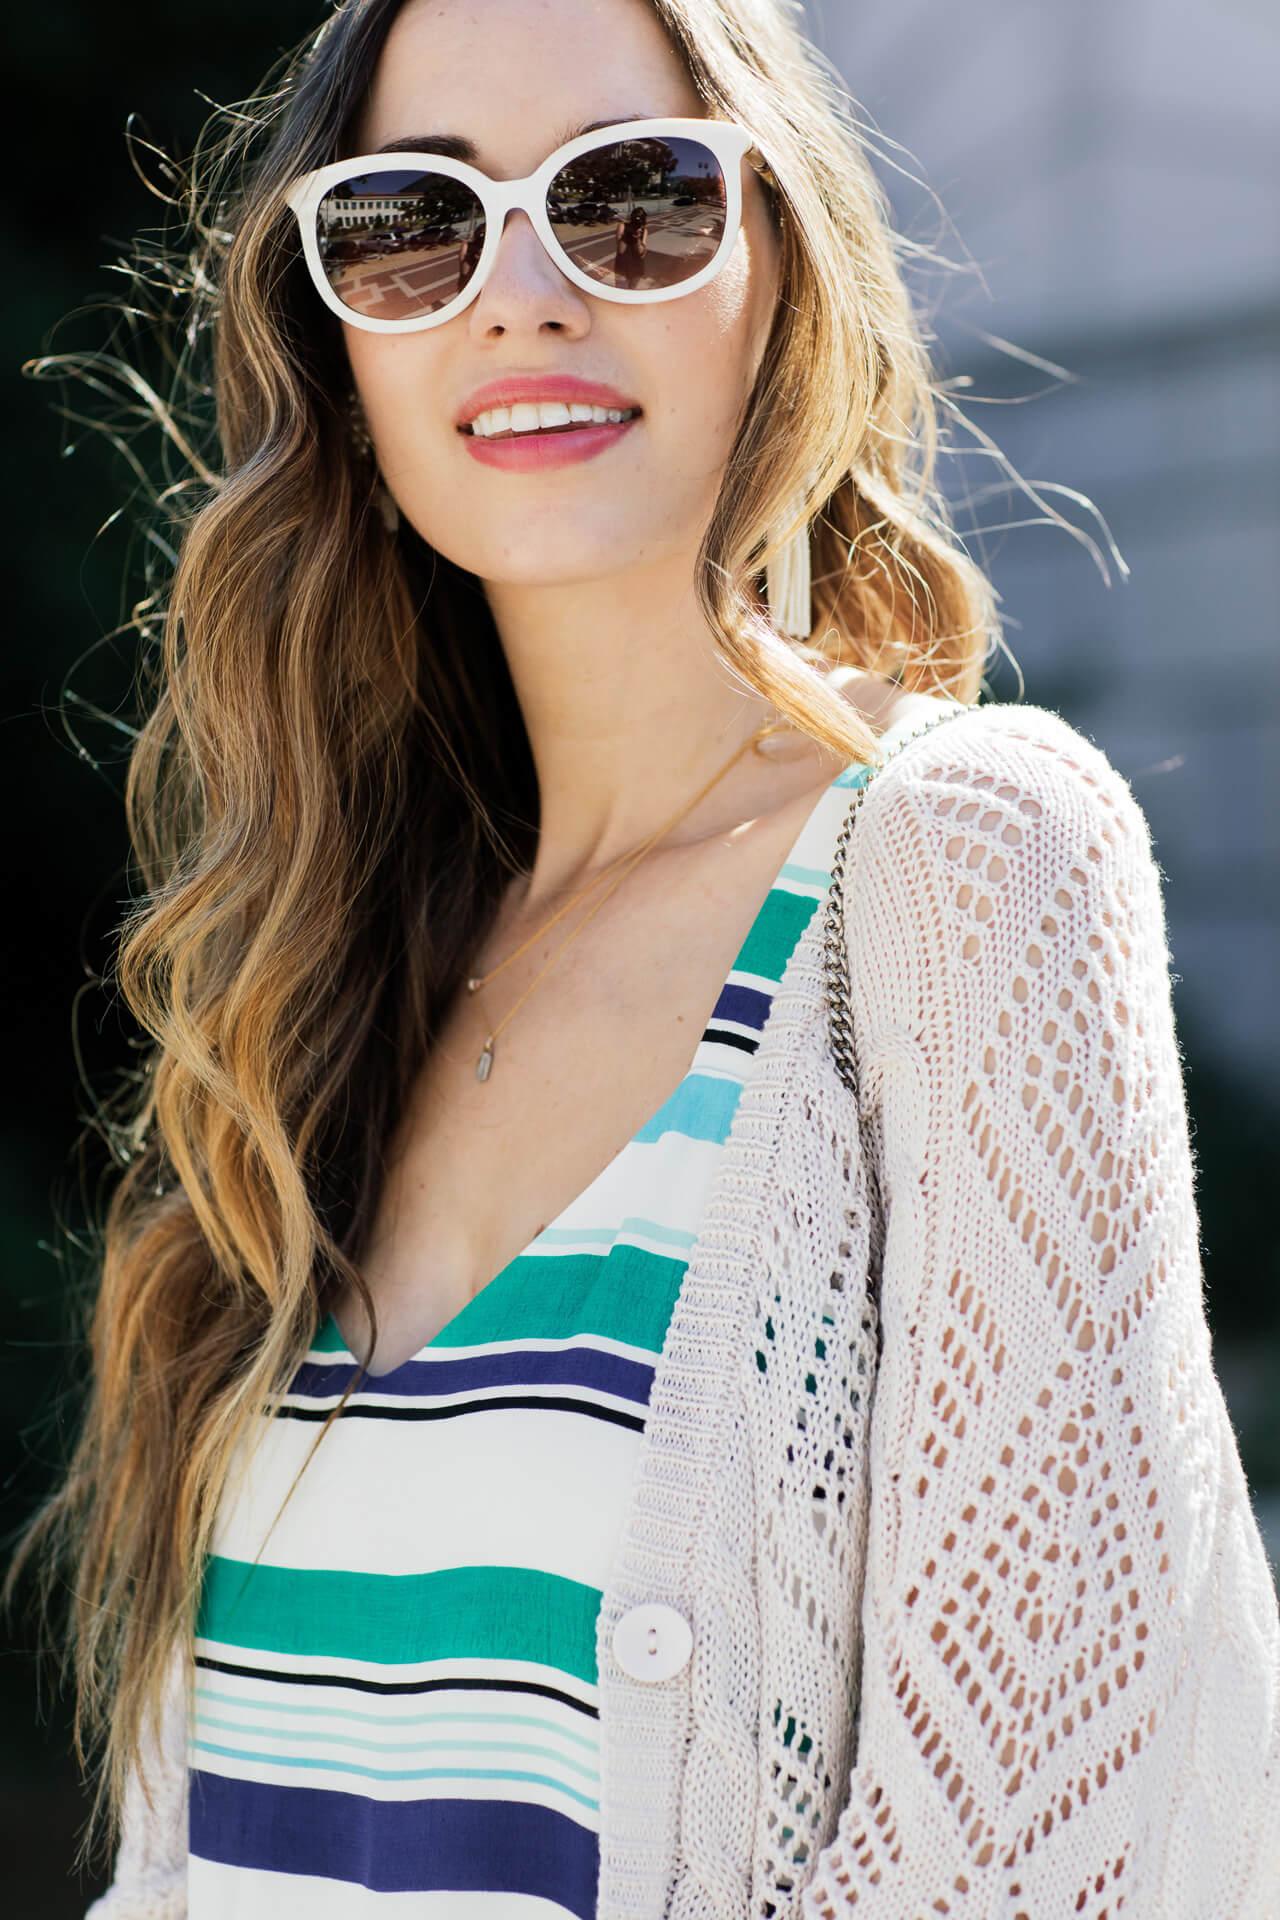 styling white sunglasses for summer - M Loves M @marmar